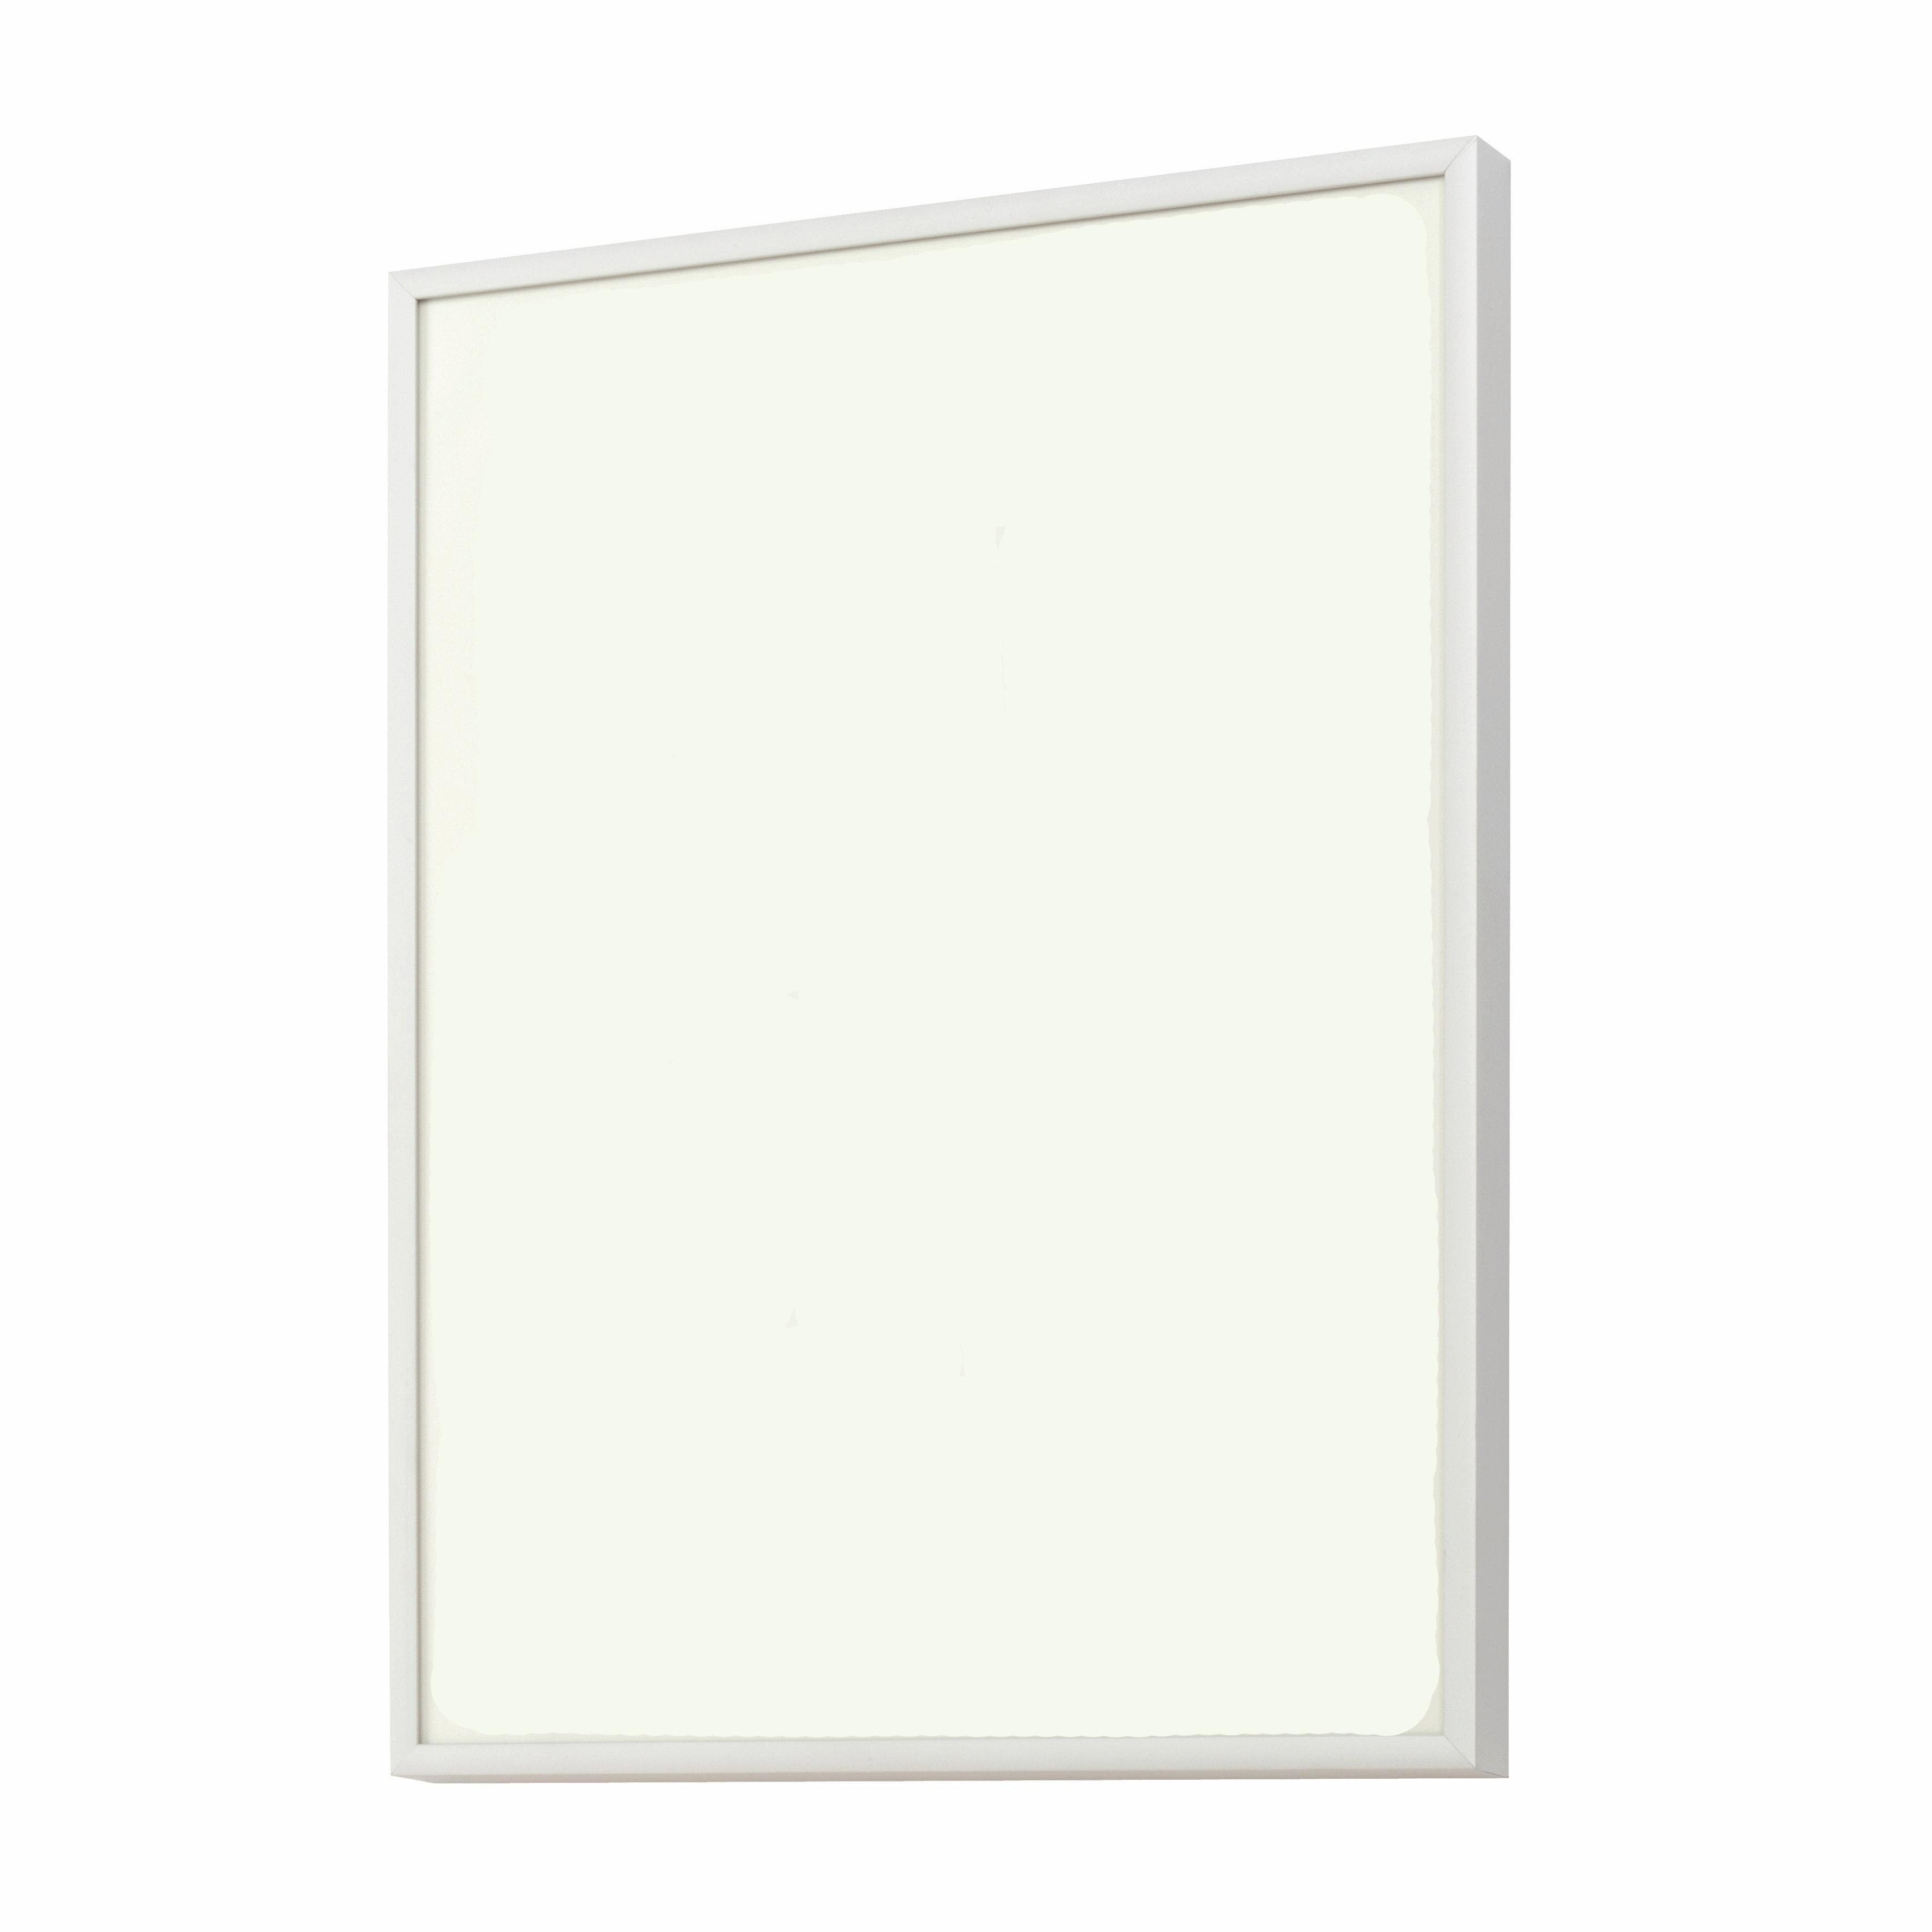 Matsolv plakatramme i aluminium l.jpg?ixlib=rb 1.1